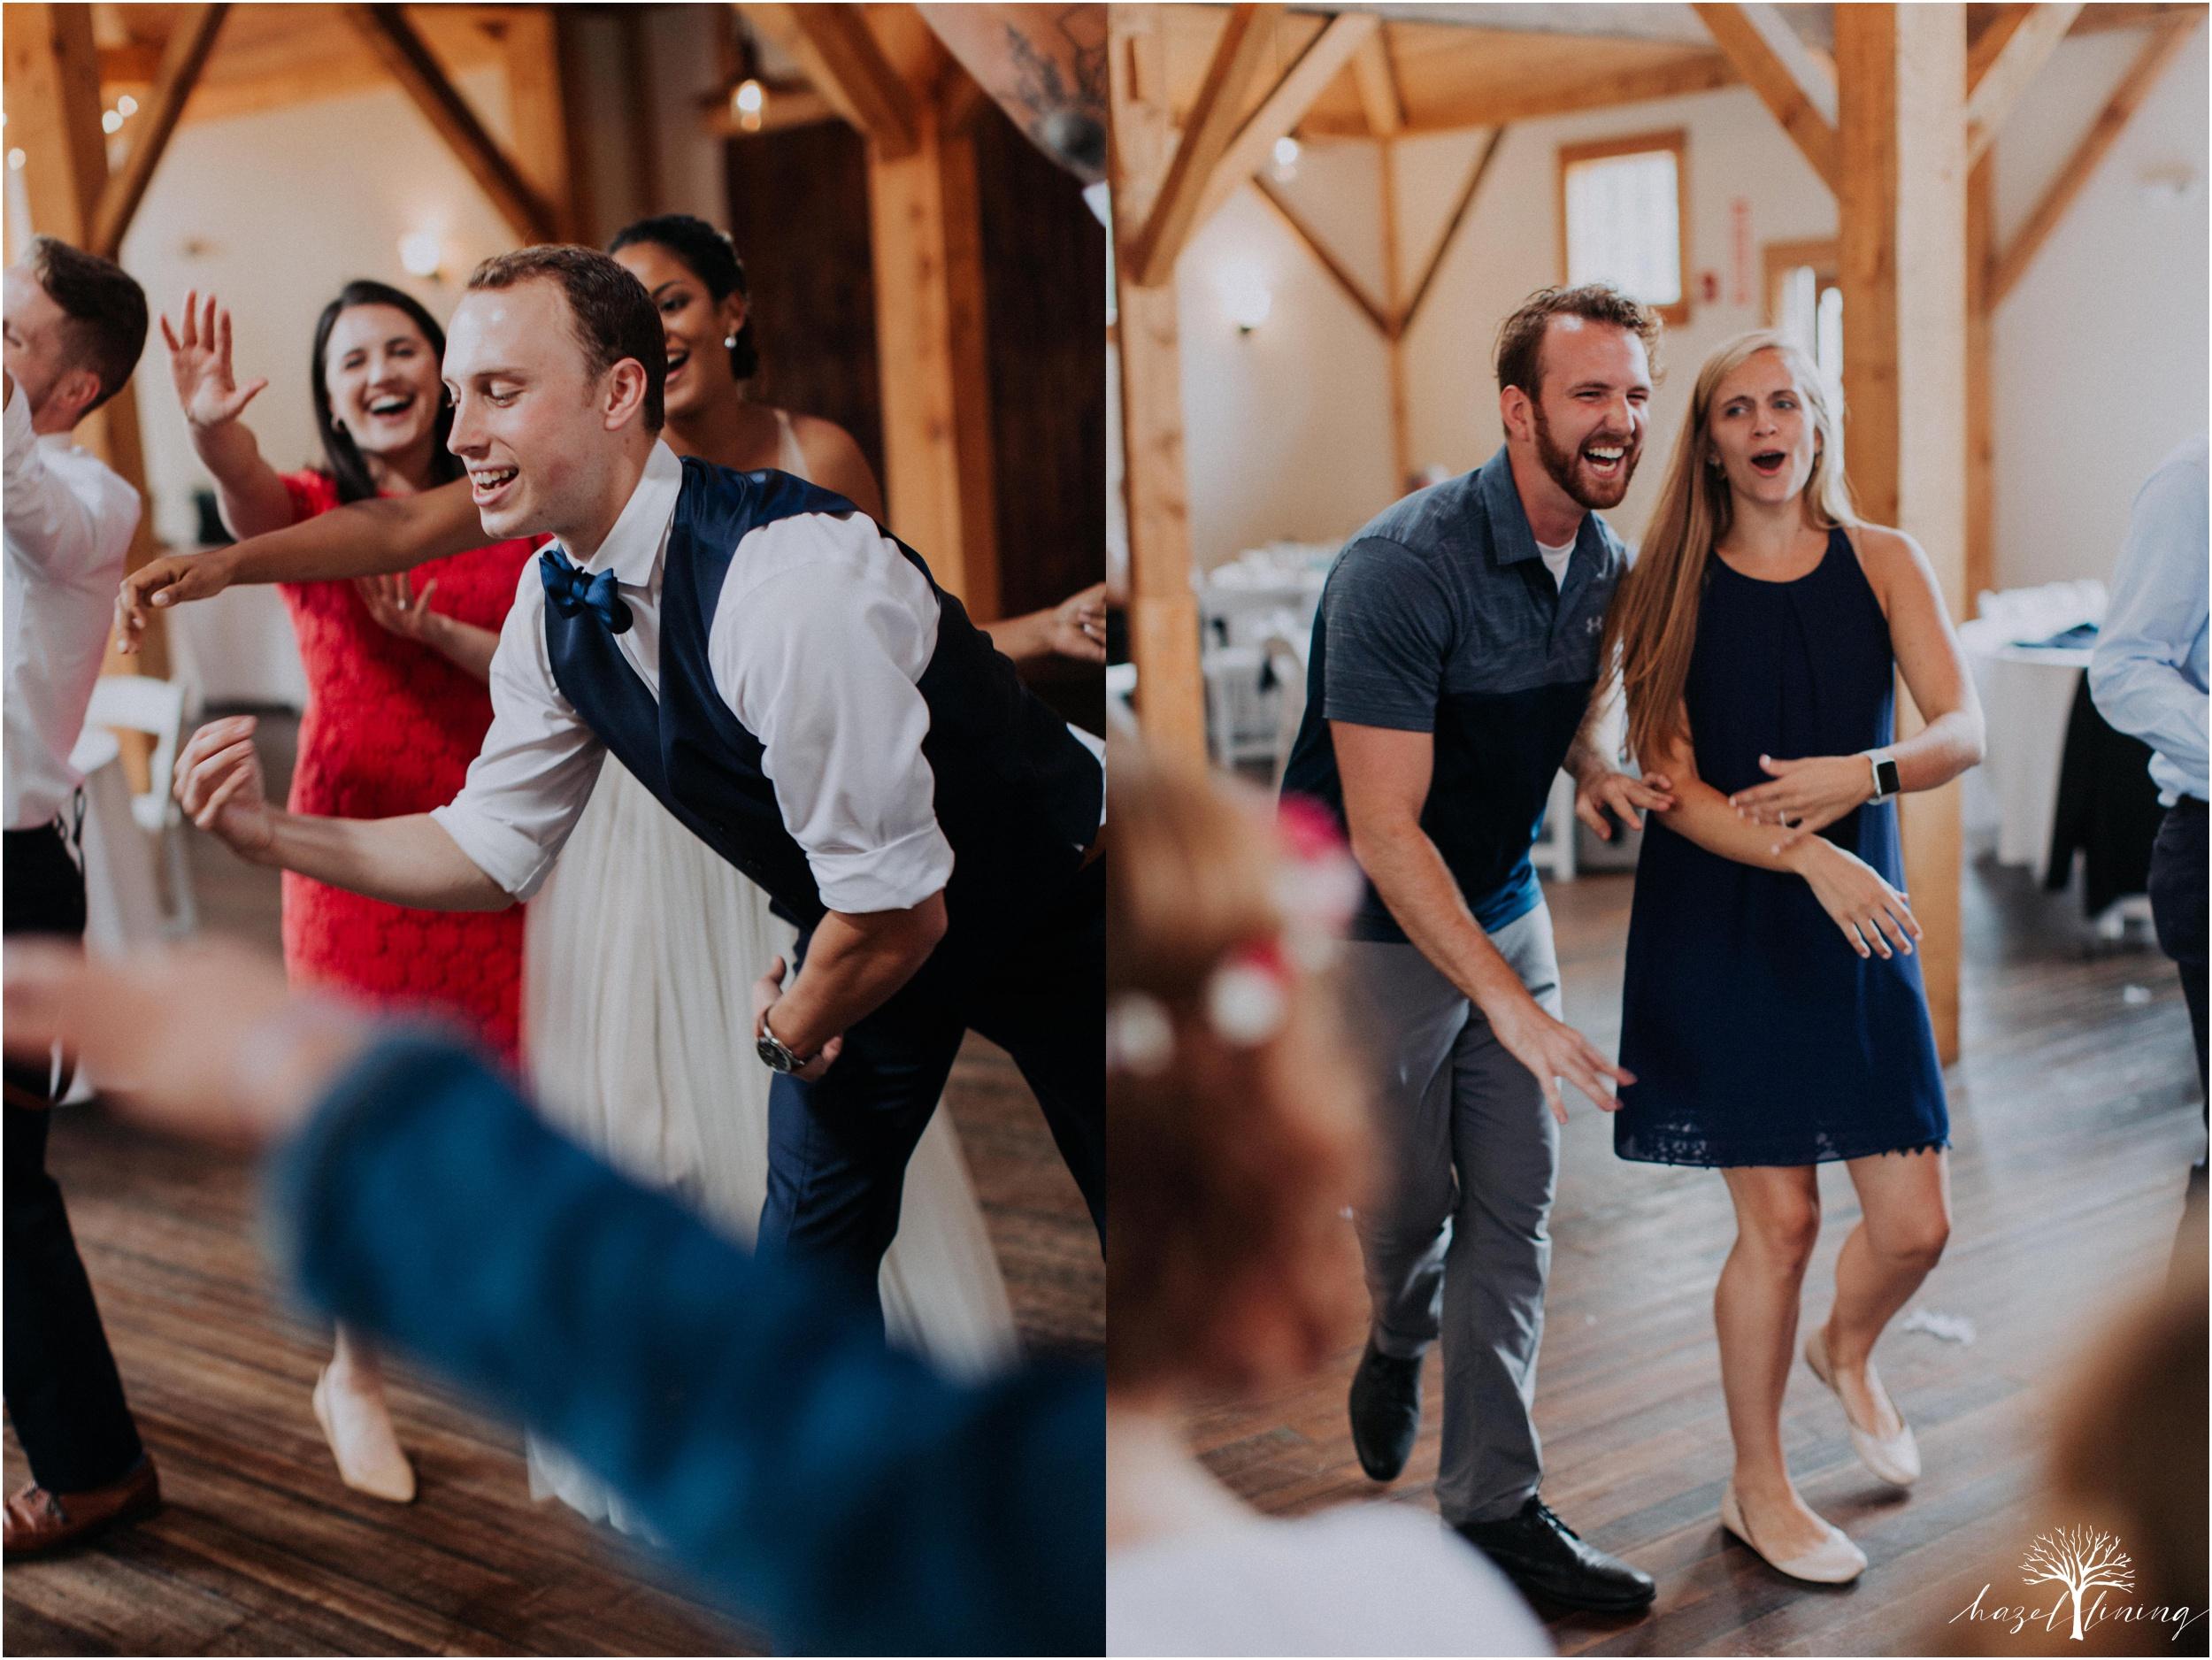 mariah-kreyling-samuel-sherratt-sherrattwiththeworld-peirce-farm-at-witch-hill-boston-massachusetts-wedding-photography-hazel-lining-travel-wedding-elopement-photography_0183.jpg